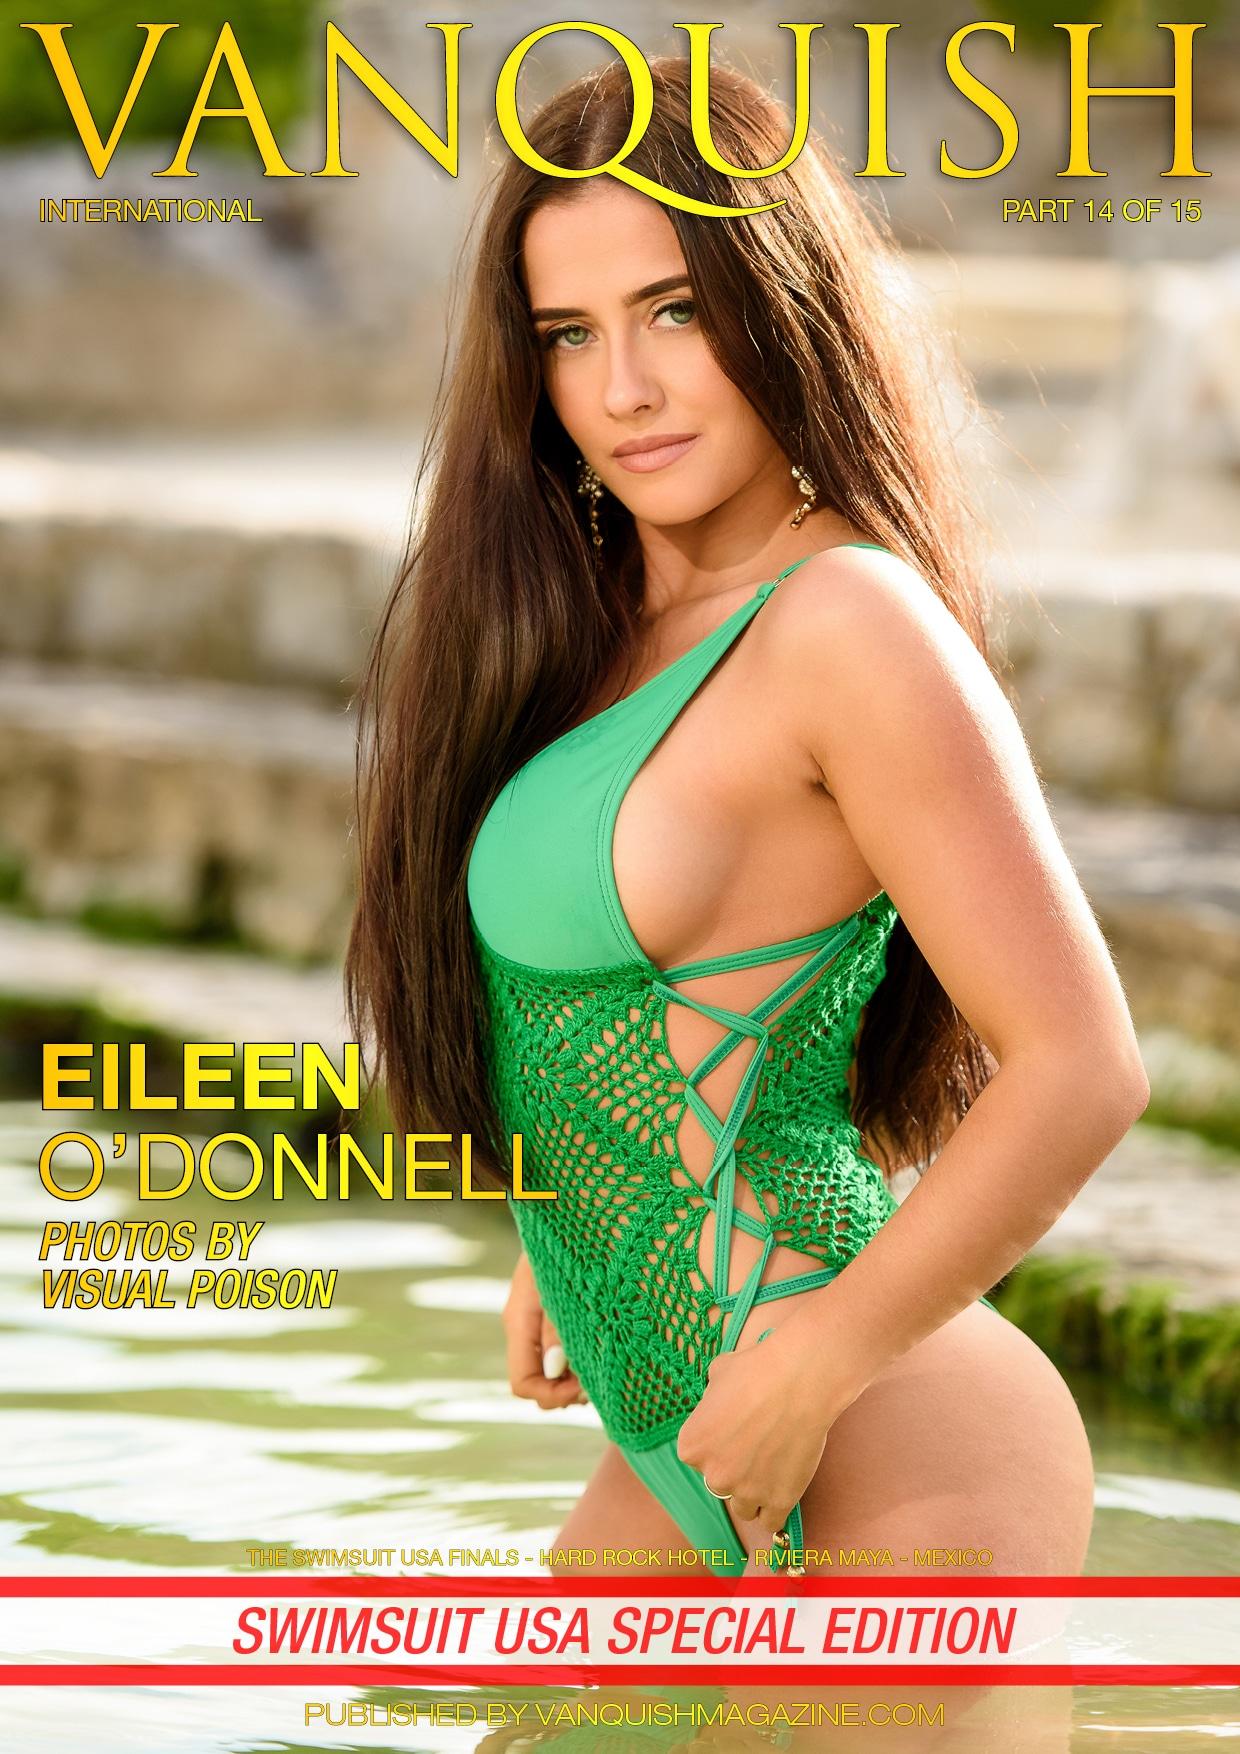 Vanquish Magazine – Swimsuit Usa – Part 14 – Eileen O'donnell